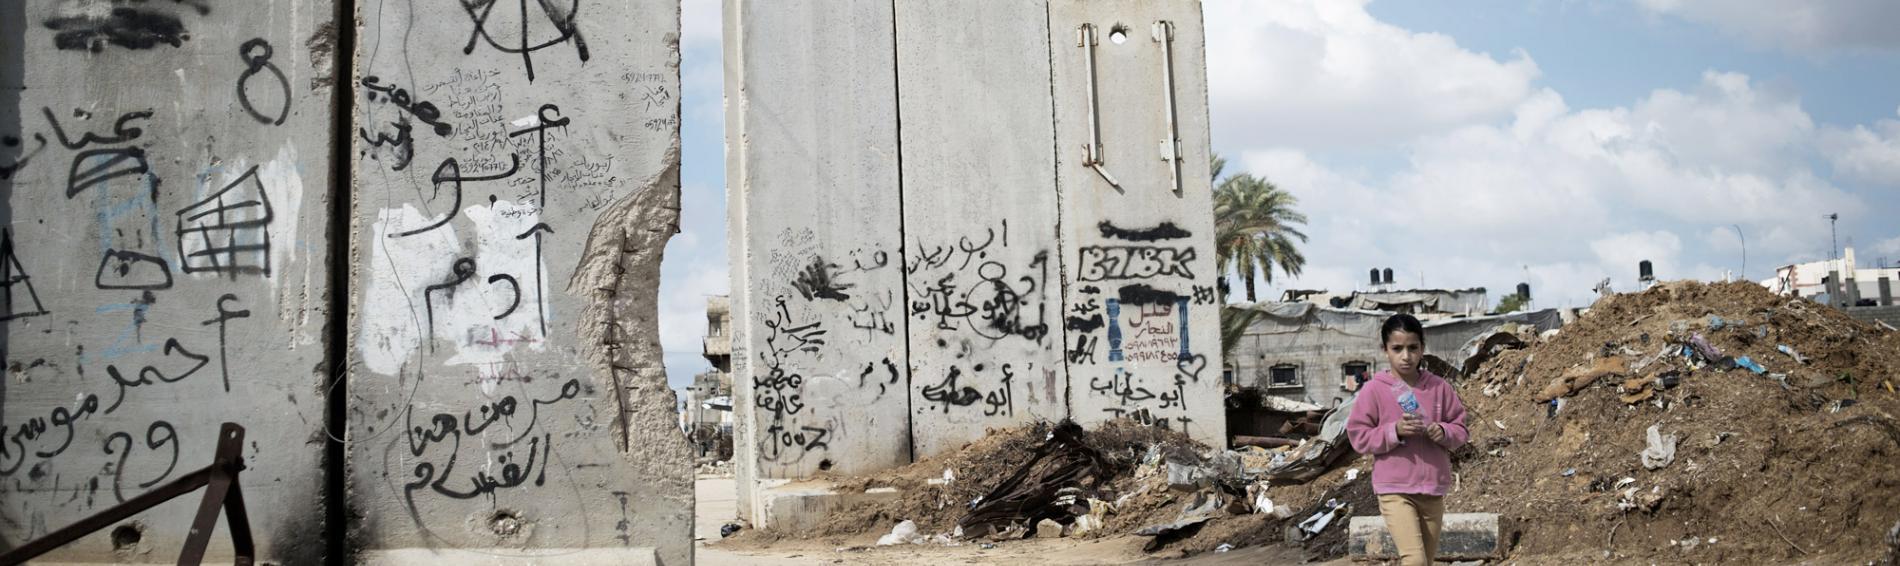 palestine_alessioromenzi_mdm